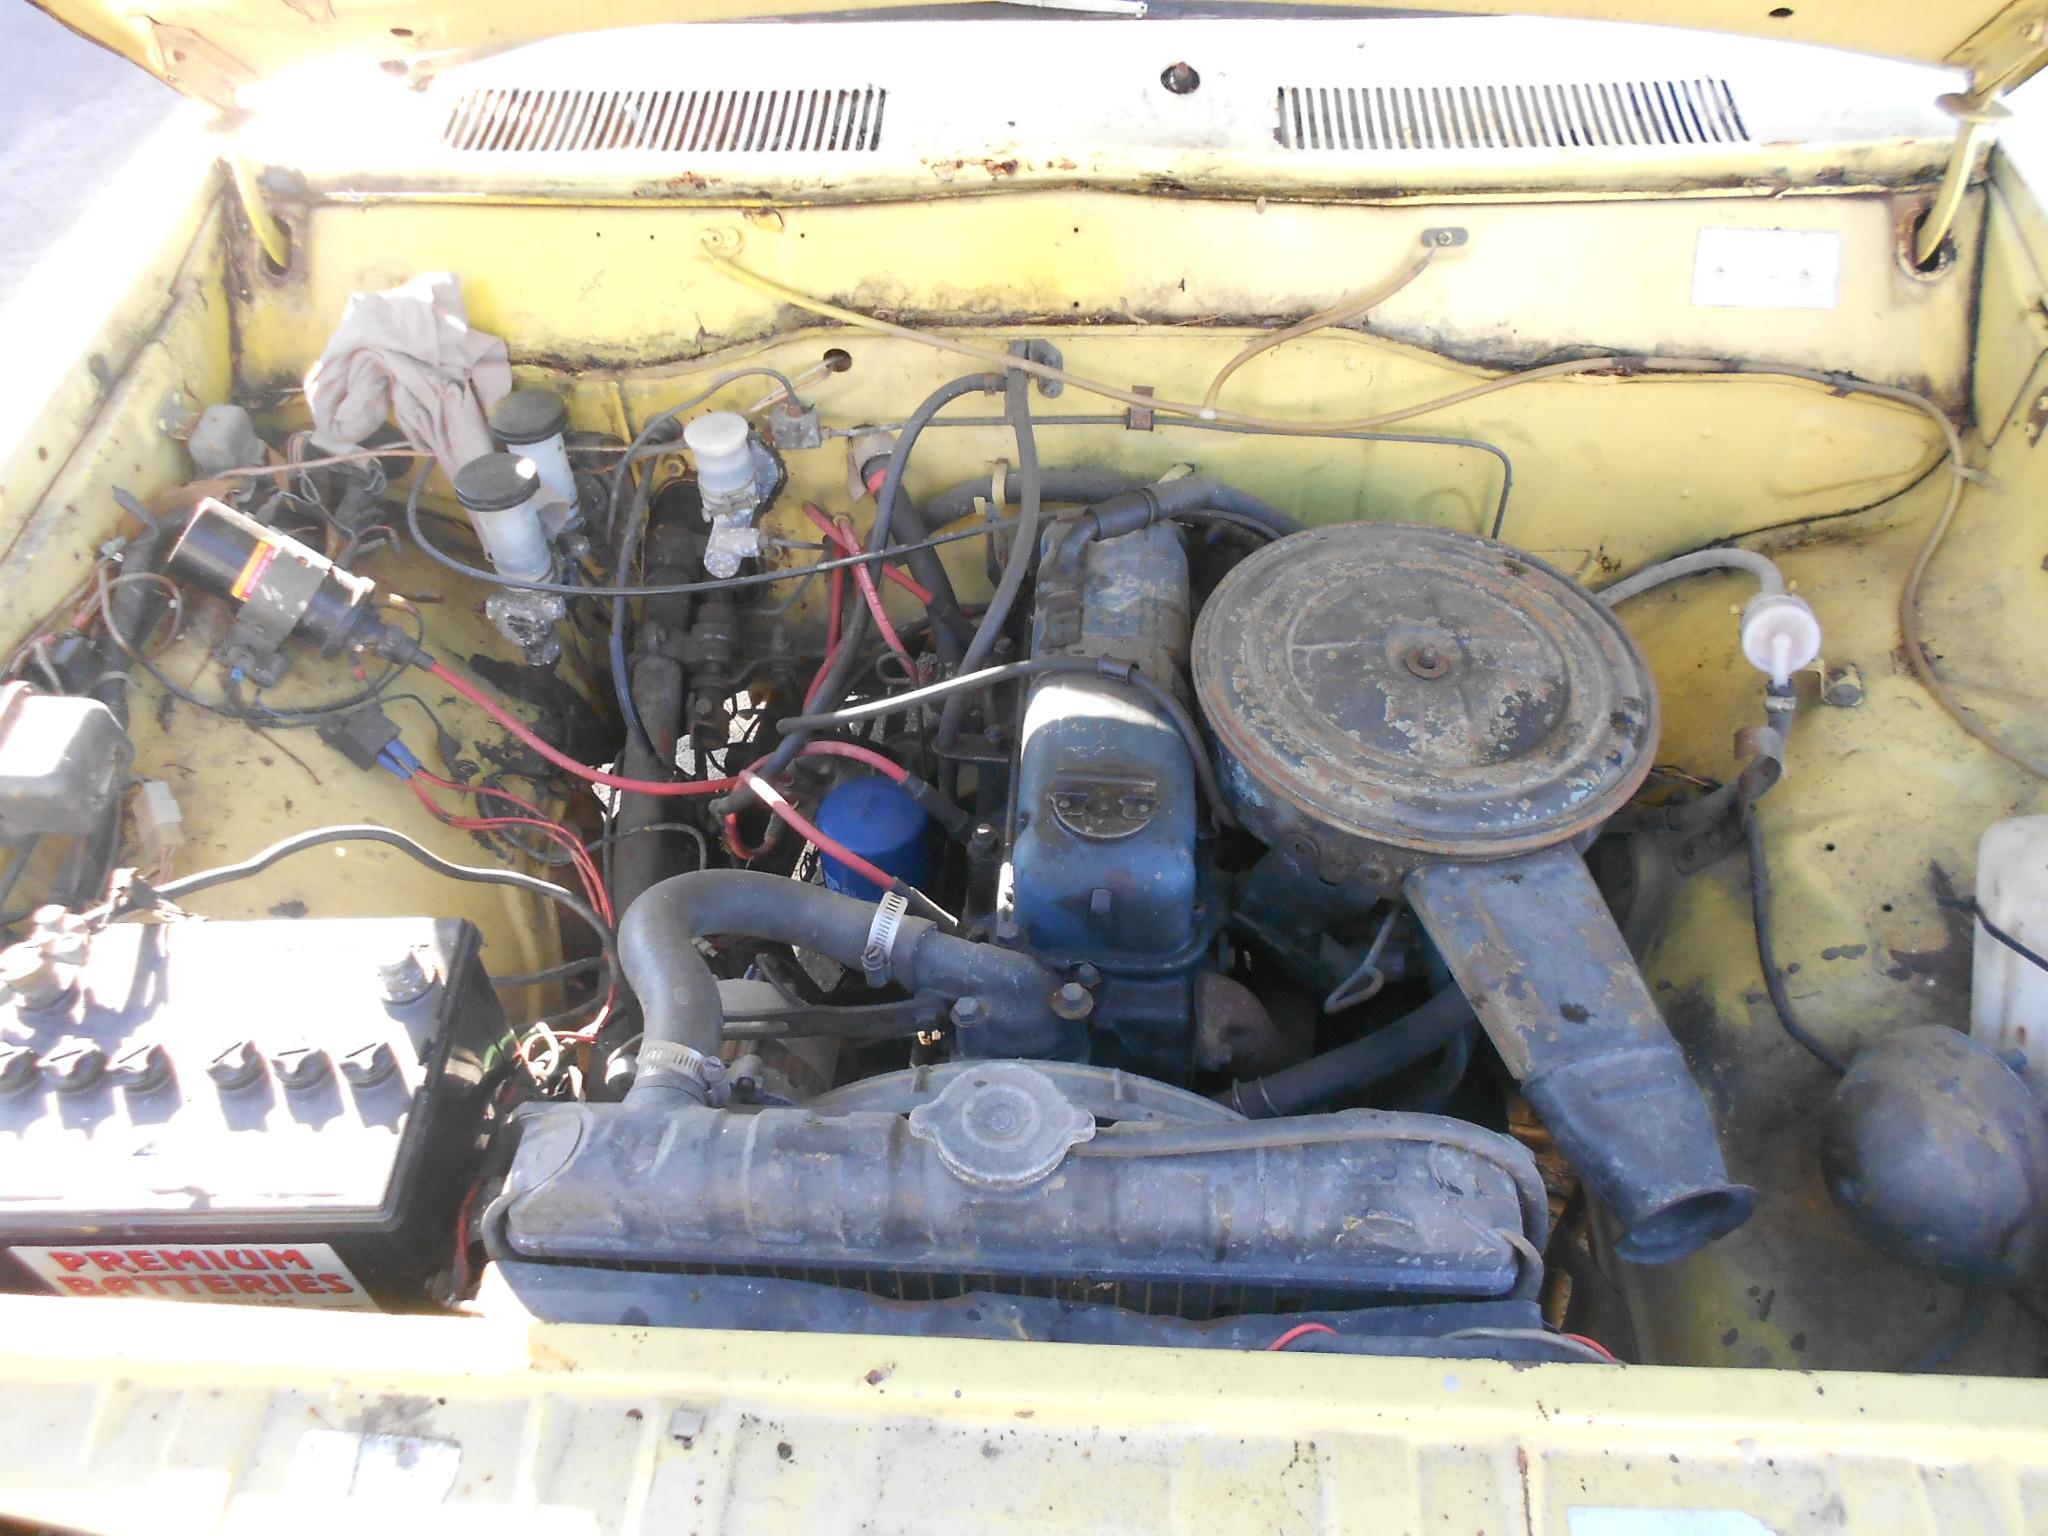 J15 Datsun Engine, J15, Free Engine Image For User Manual ...